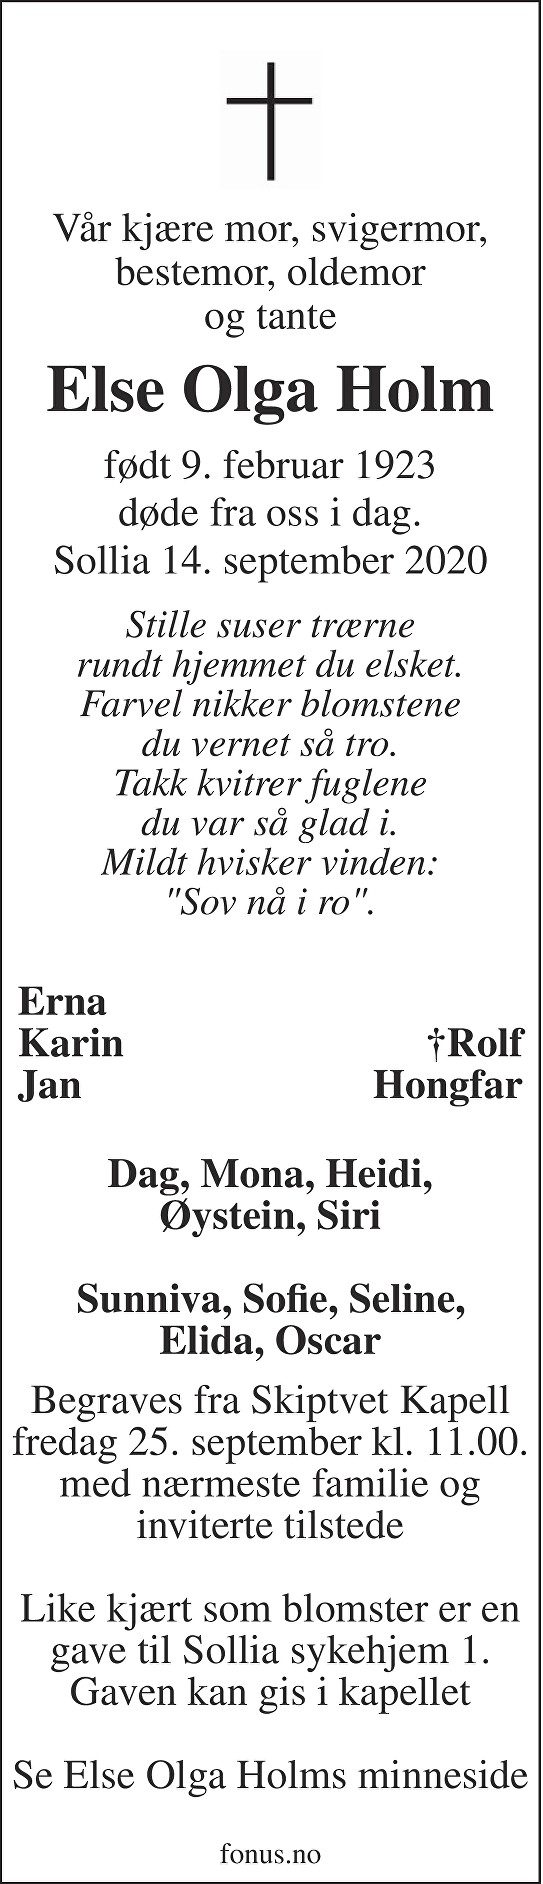 Else Olga Holm Dødsannonse